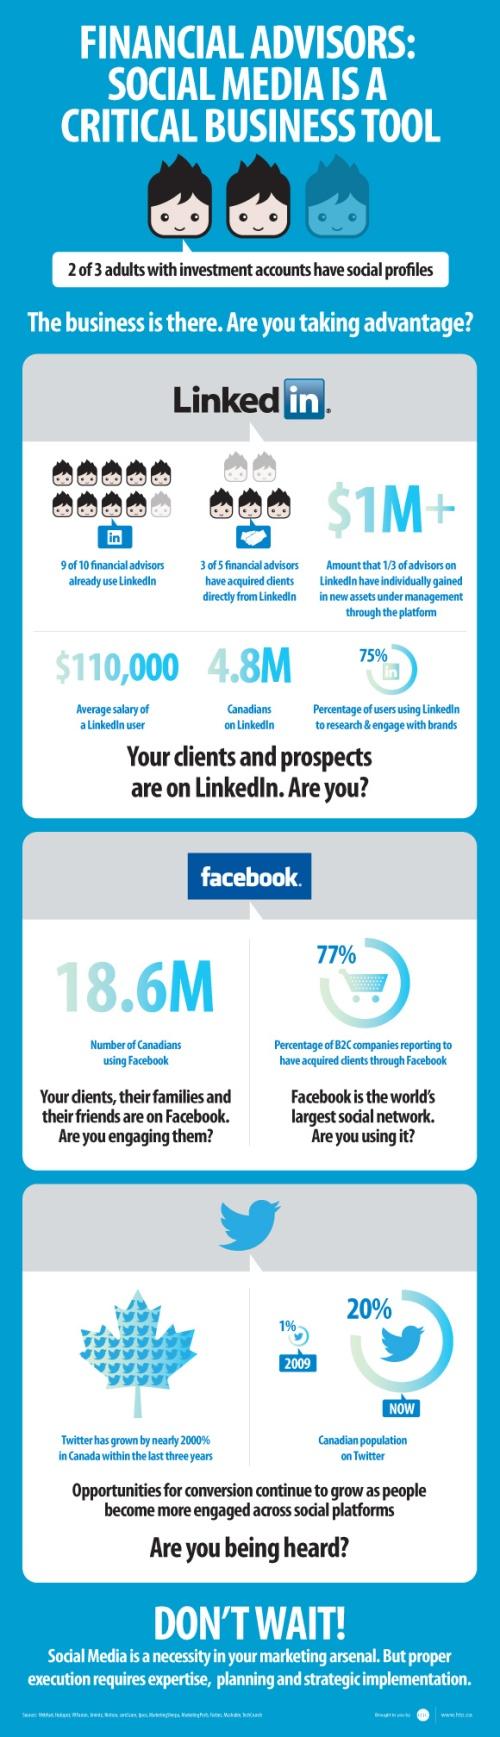 financial-advisors-social-media-is-a-critical-business-tool_50f82ab0b4395